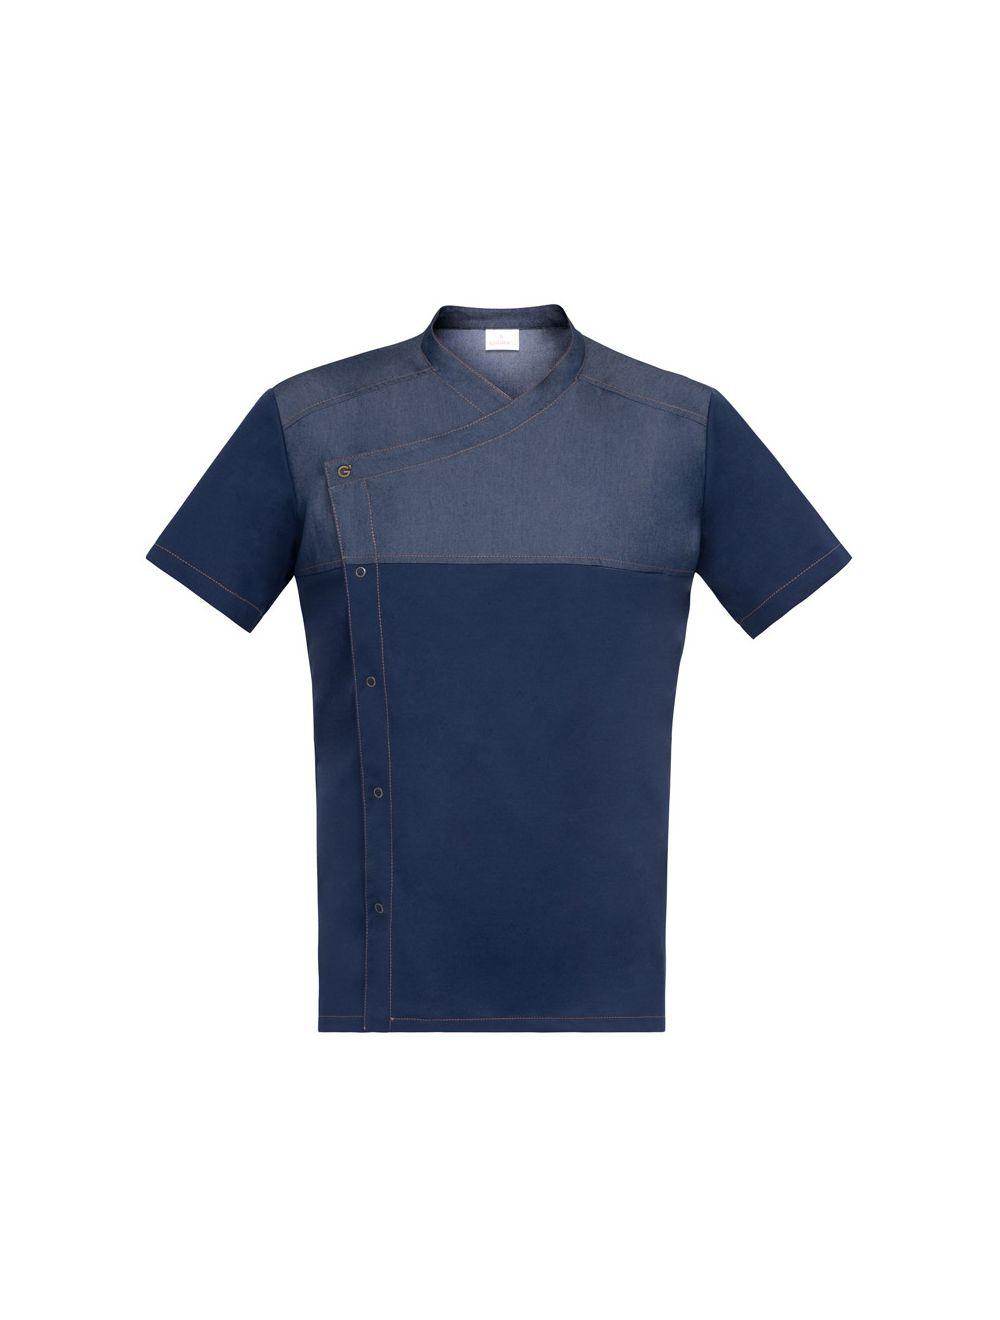 giblor_s-lapo-21p08g251-jeans-blu-sv